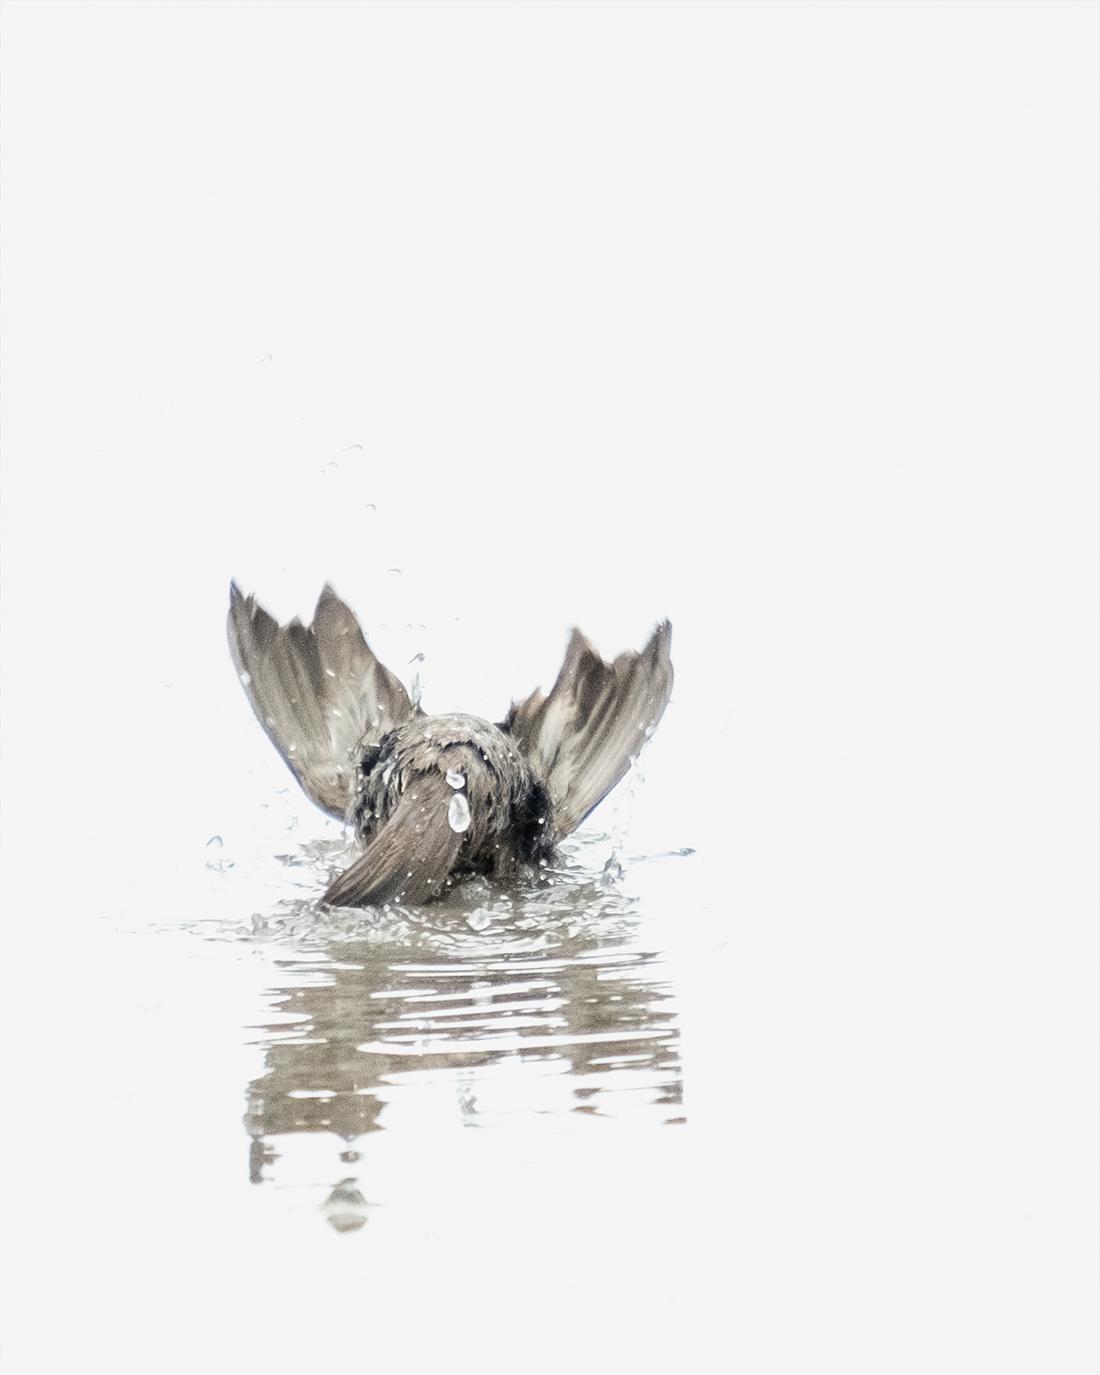 DSCF7546-1-WEB-ciliestad-bathing-housesparrow-fuglefoto-kunstfoto-trondheim